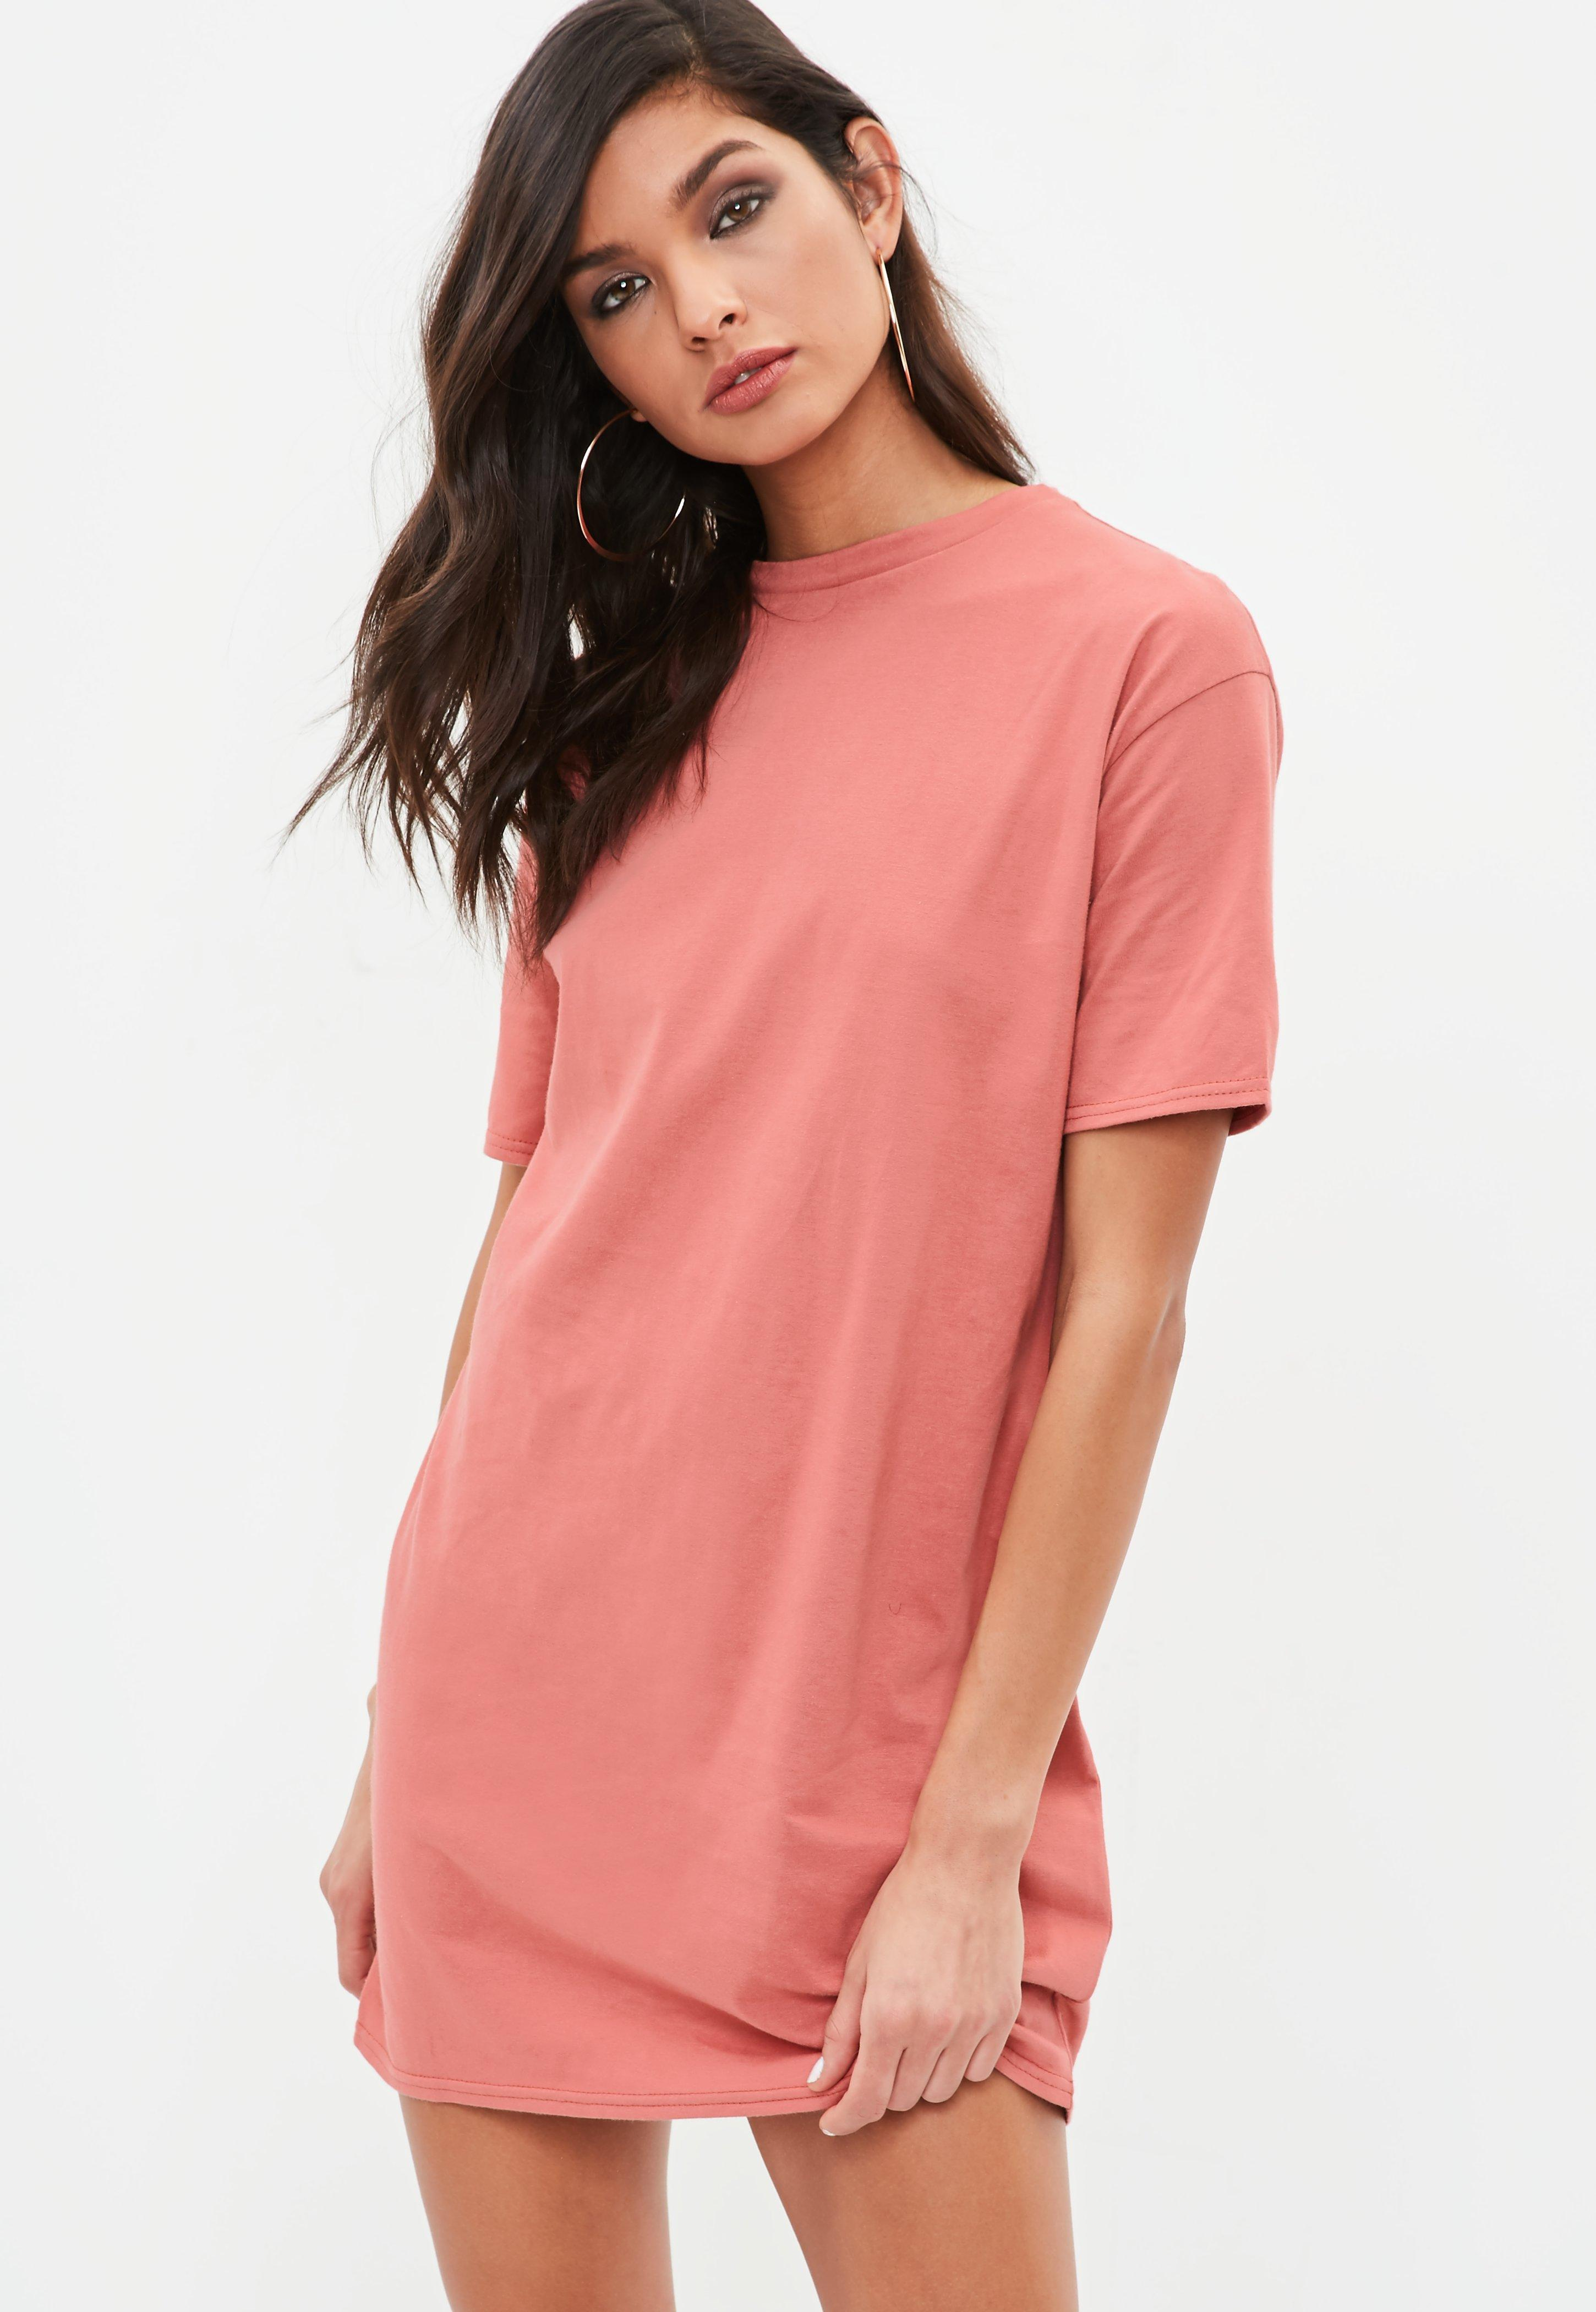 Womens Oversized Tee Shirts